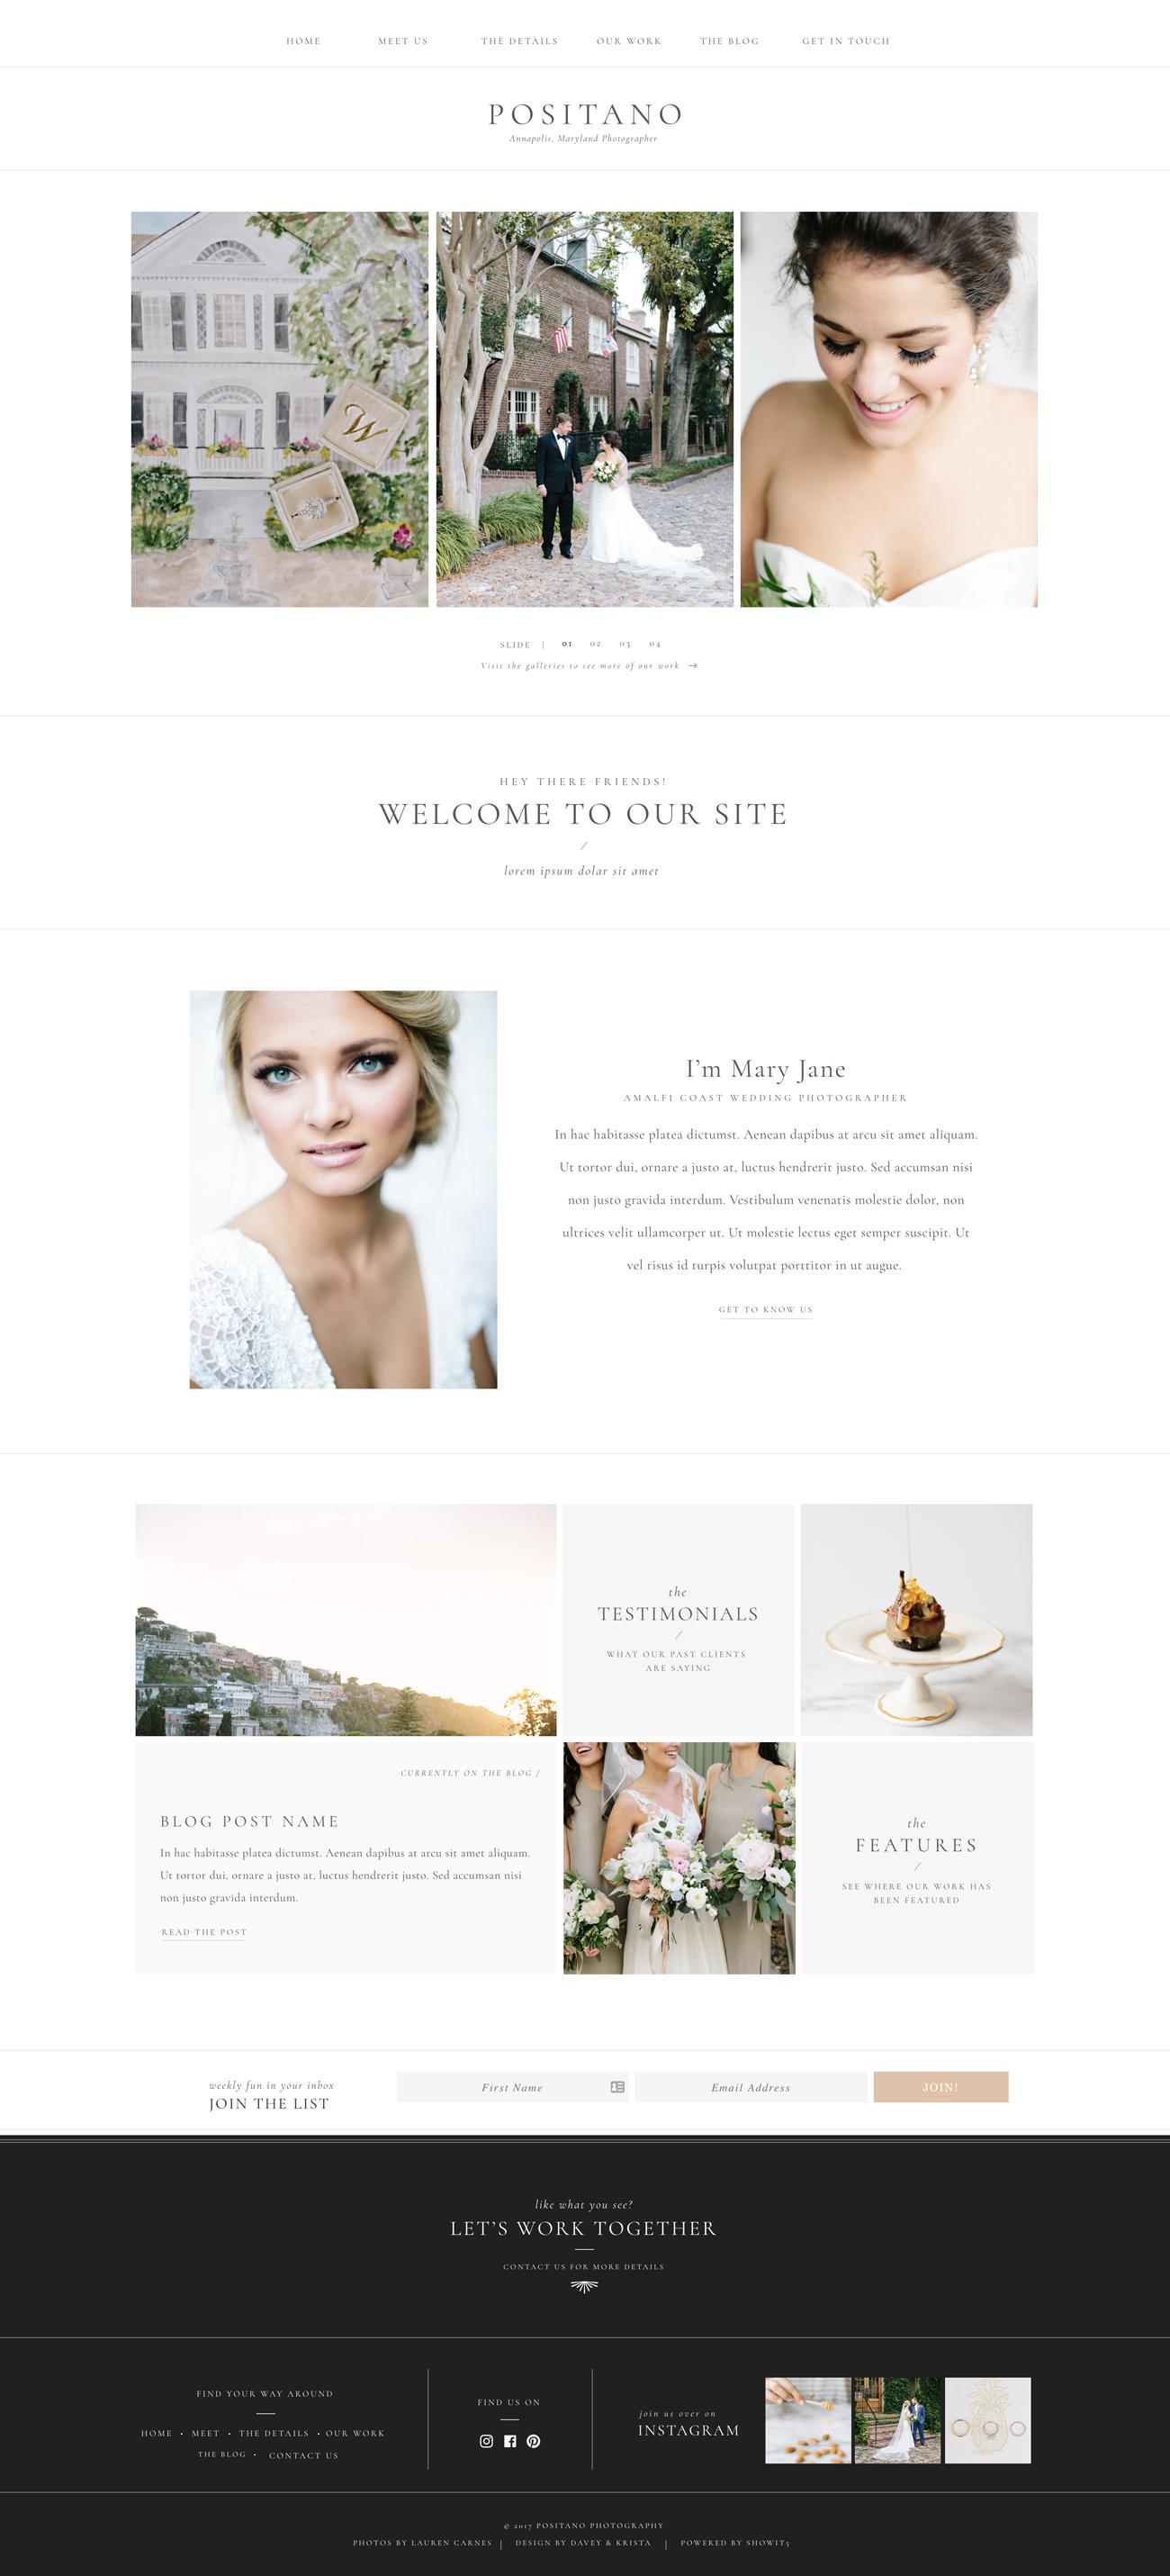 Positano Showit Davey Krista Wedding Planner Website Wedding Website Design Web Design Tips